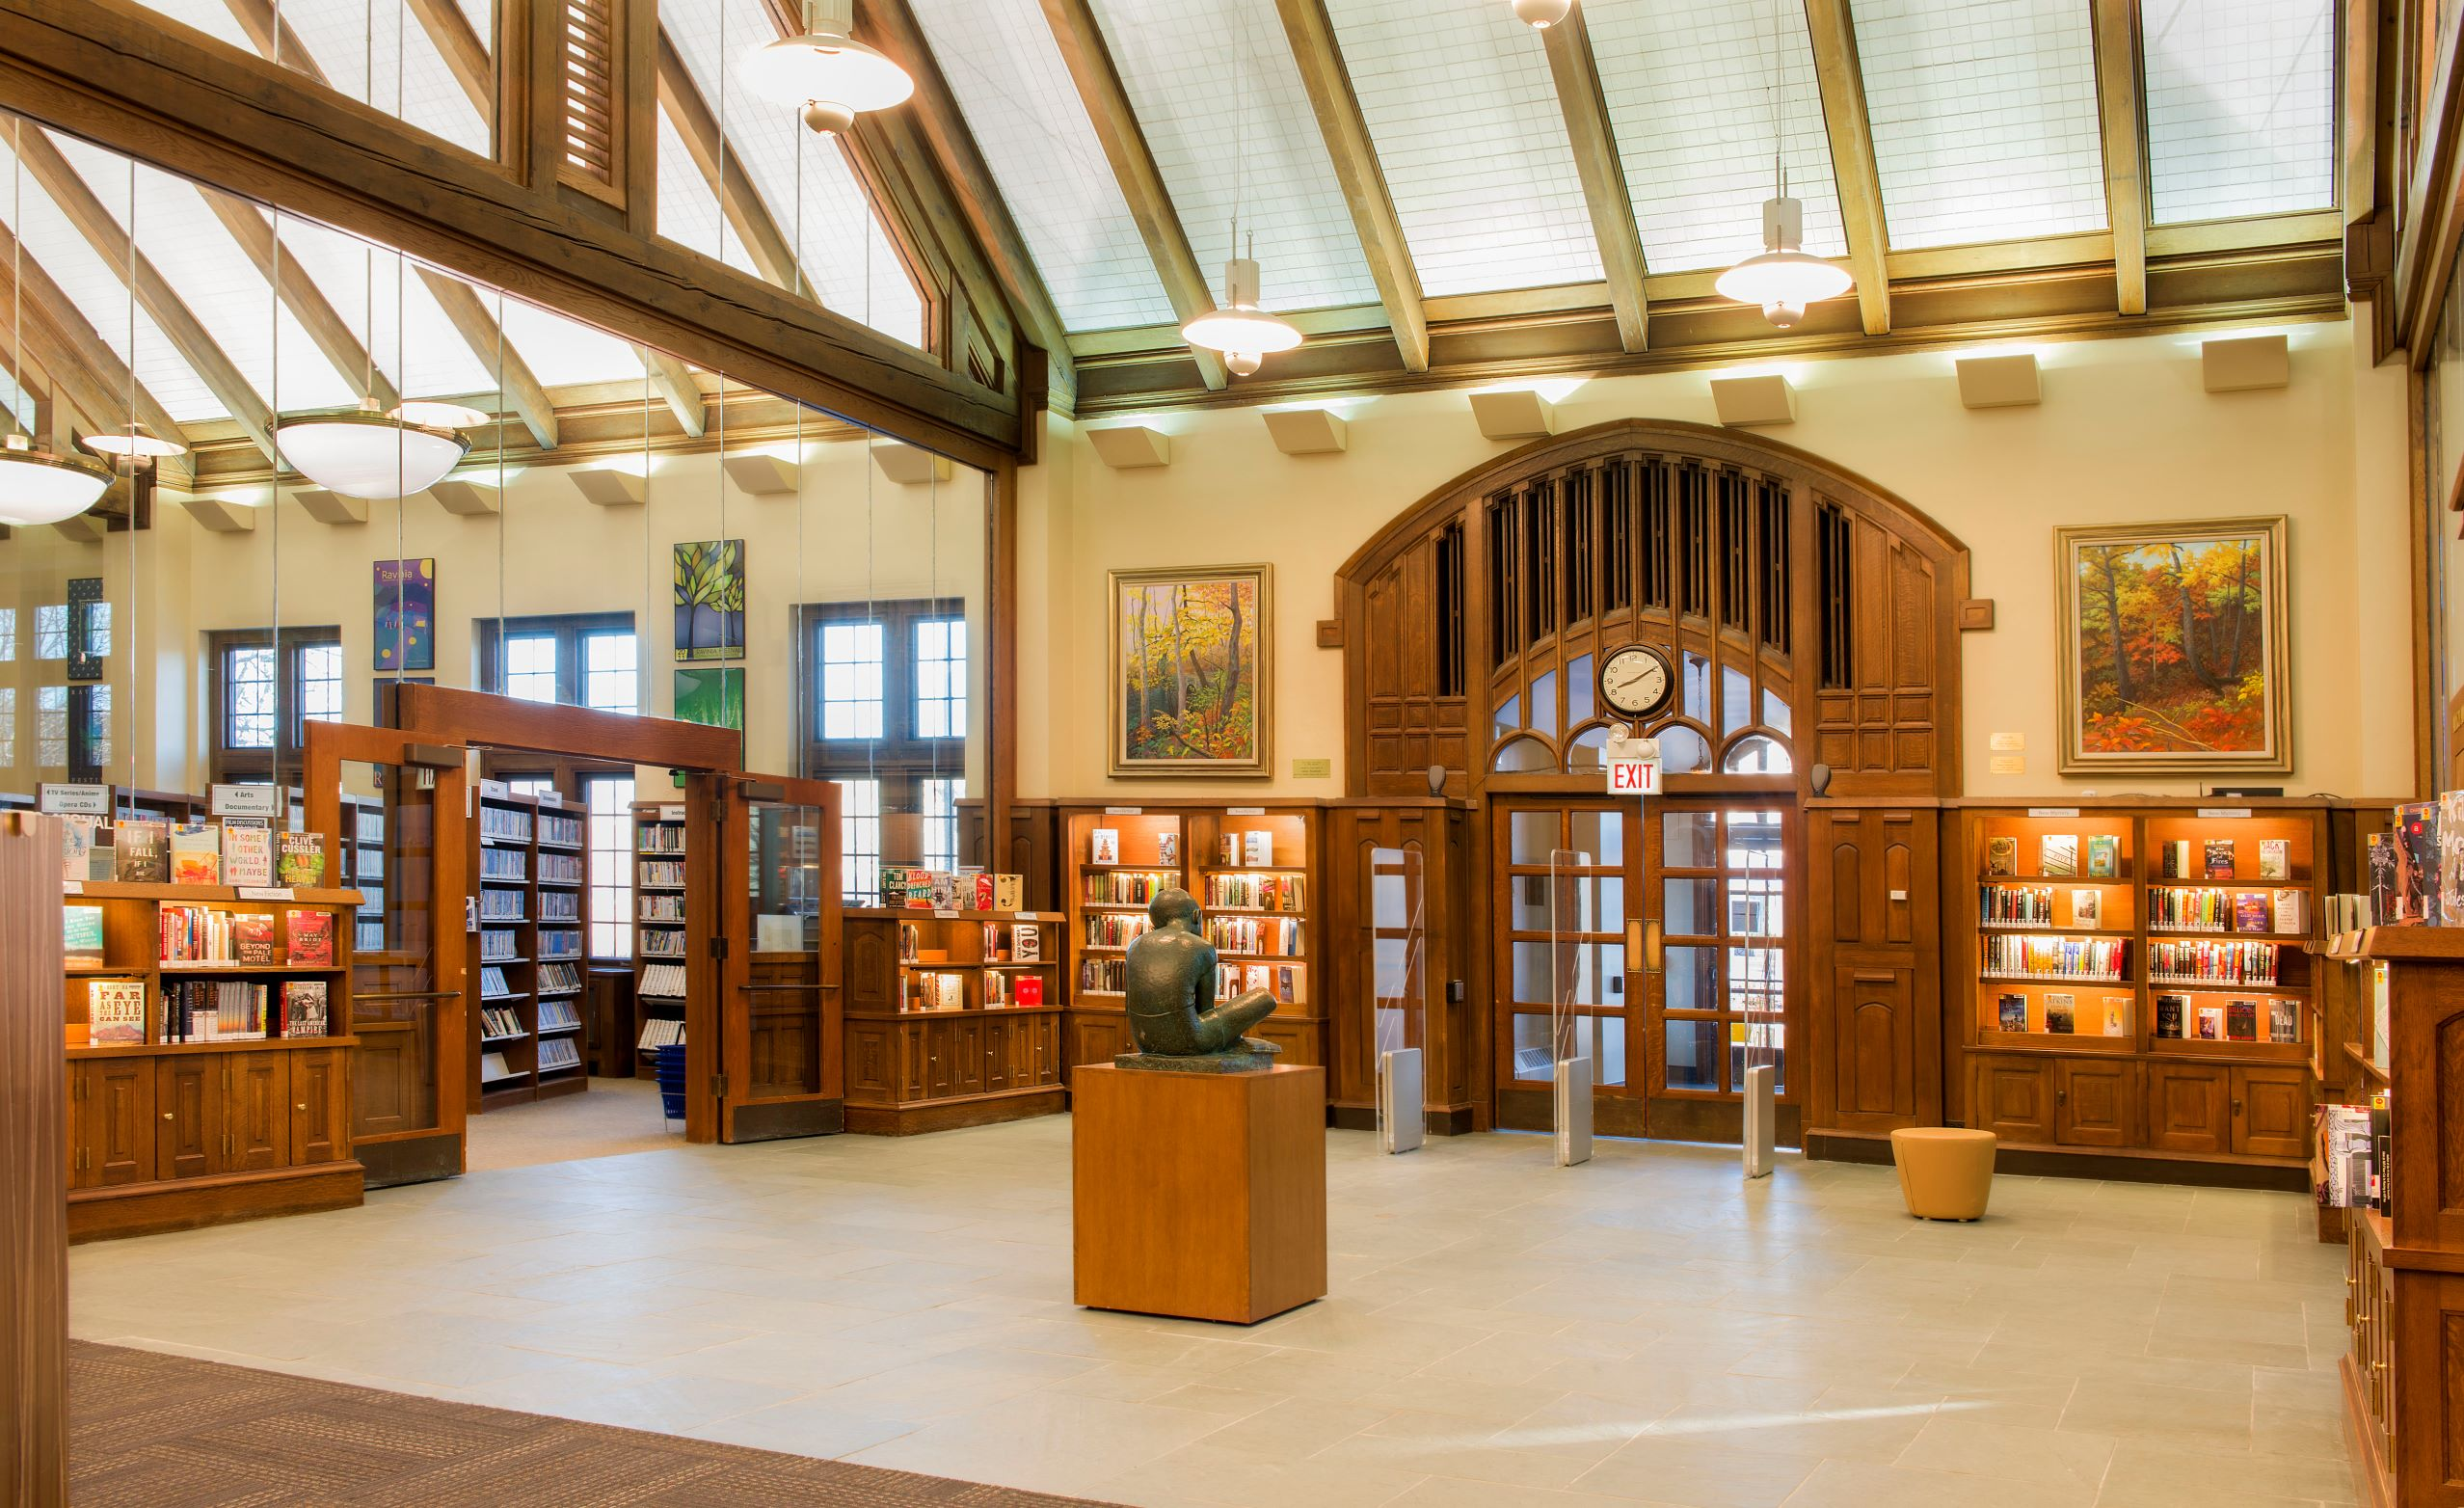 Highland Highland Park Library, Highland Park, IL